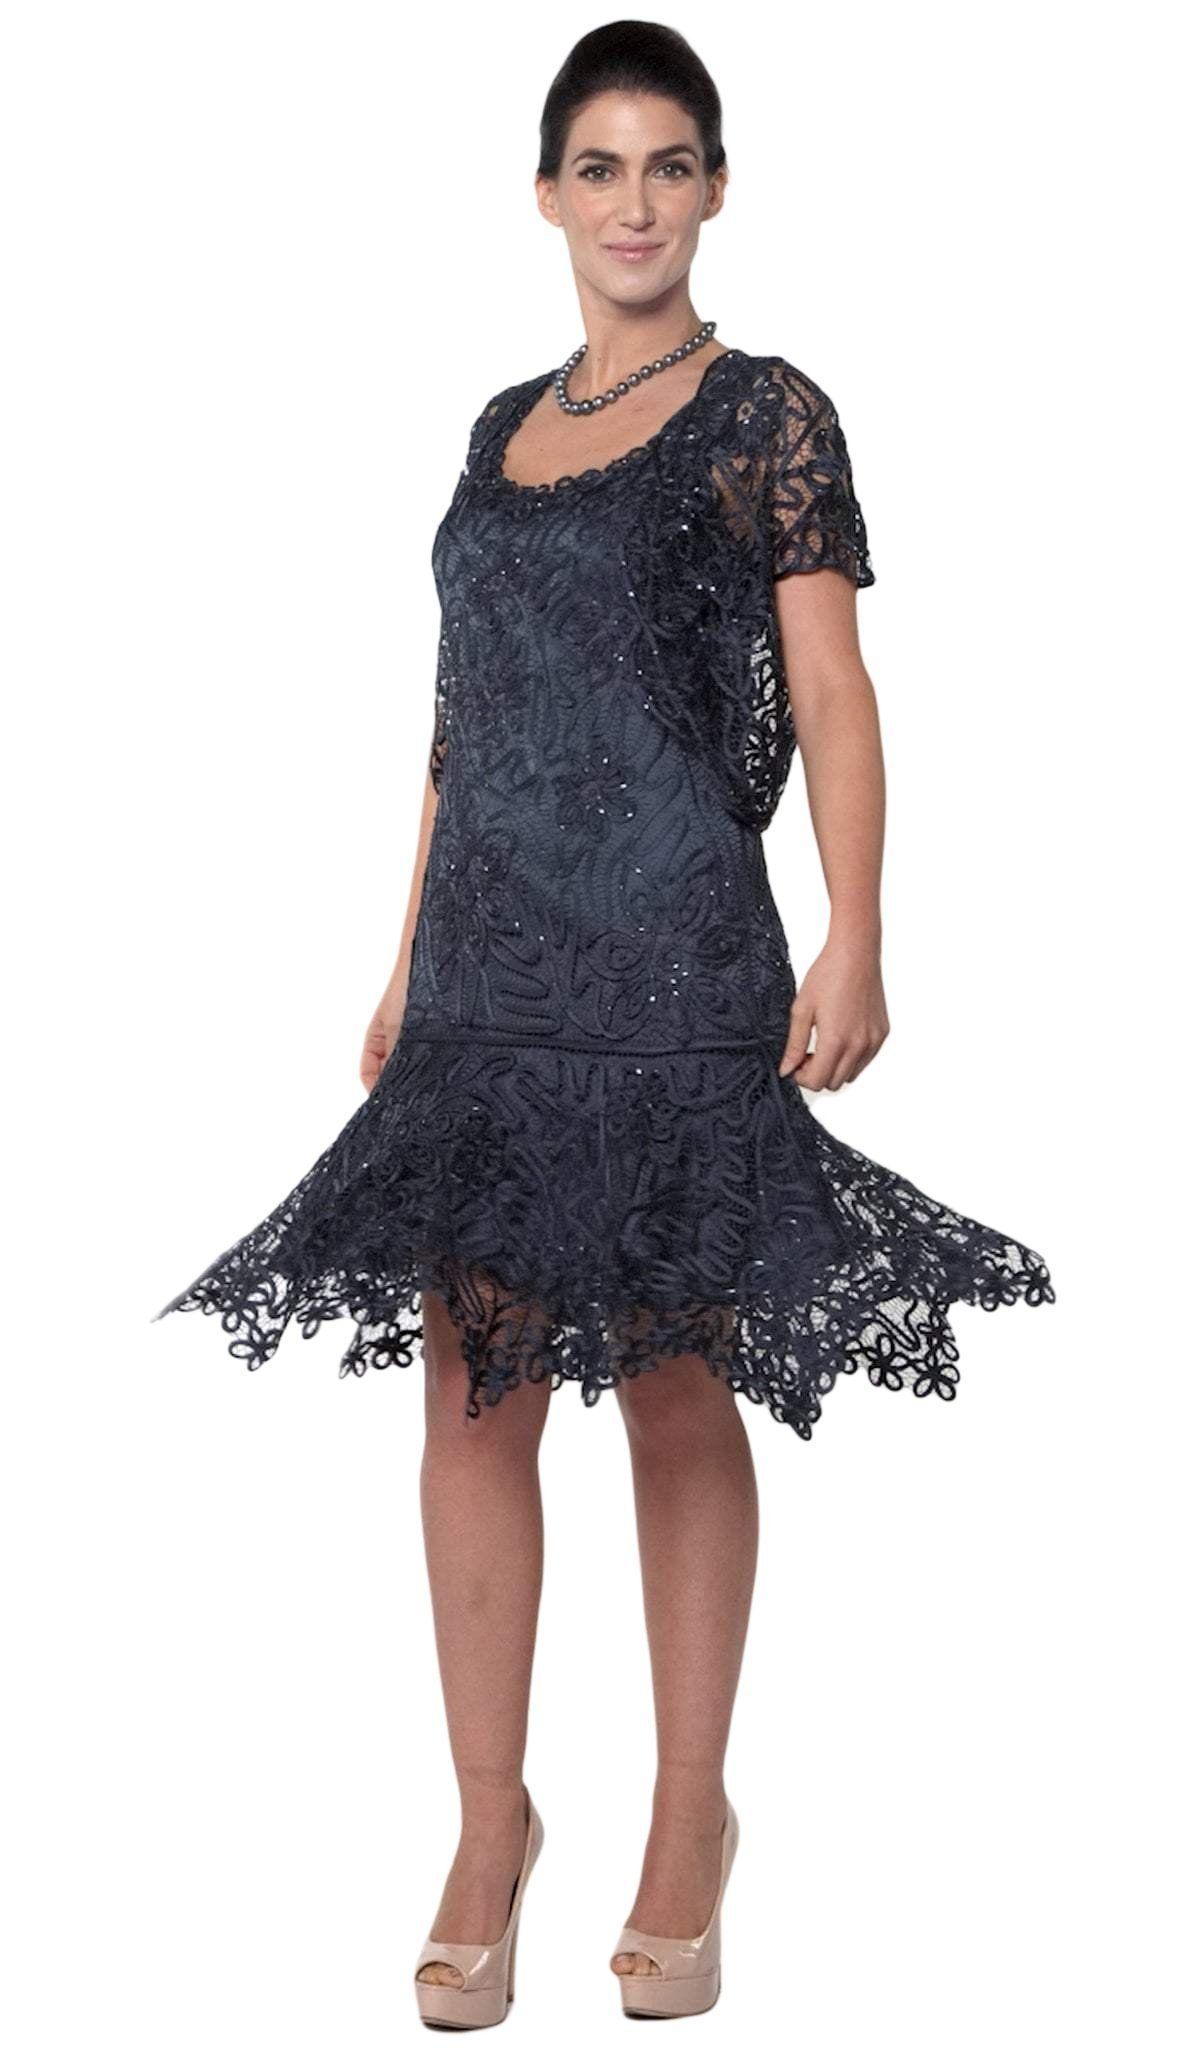 Soulmates C7185 Dress - MadameBridal.com